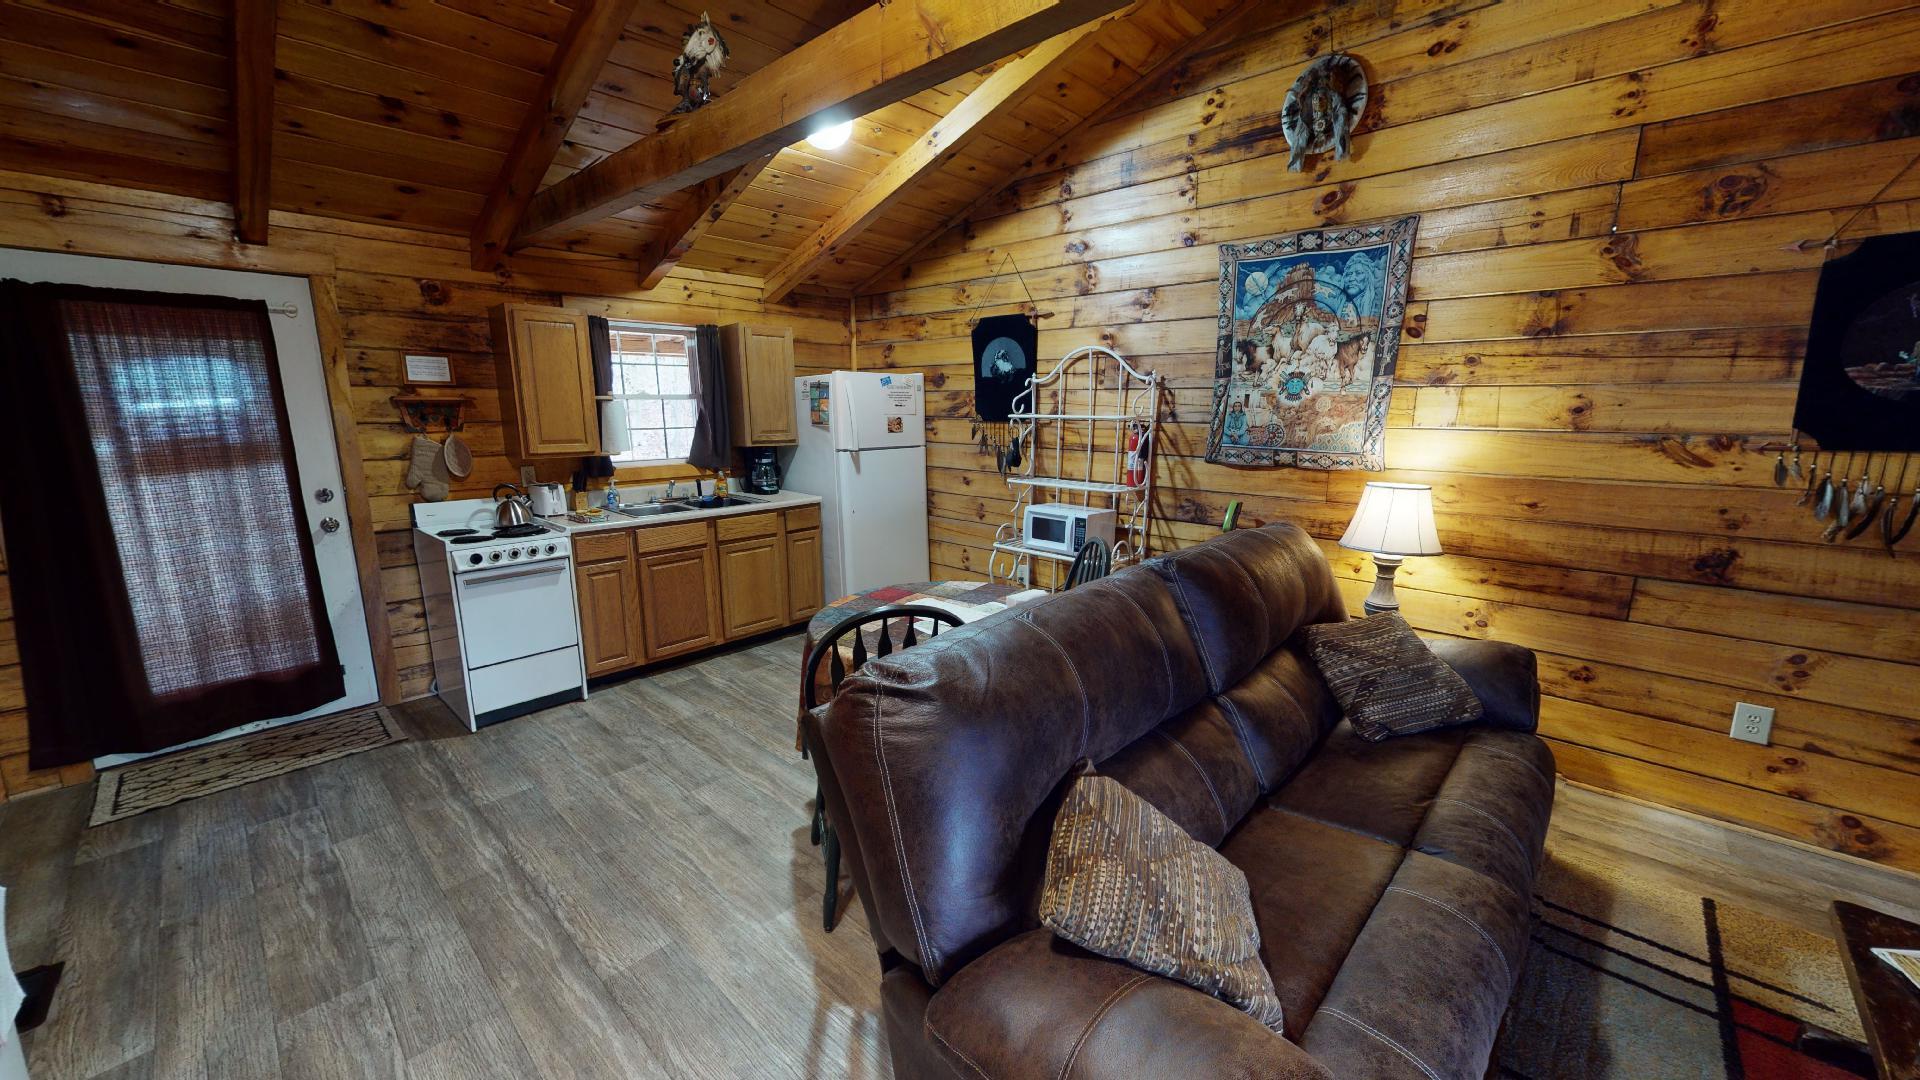 The Lakota Living - Living and kitchen view.